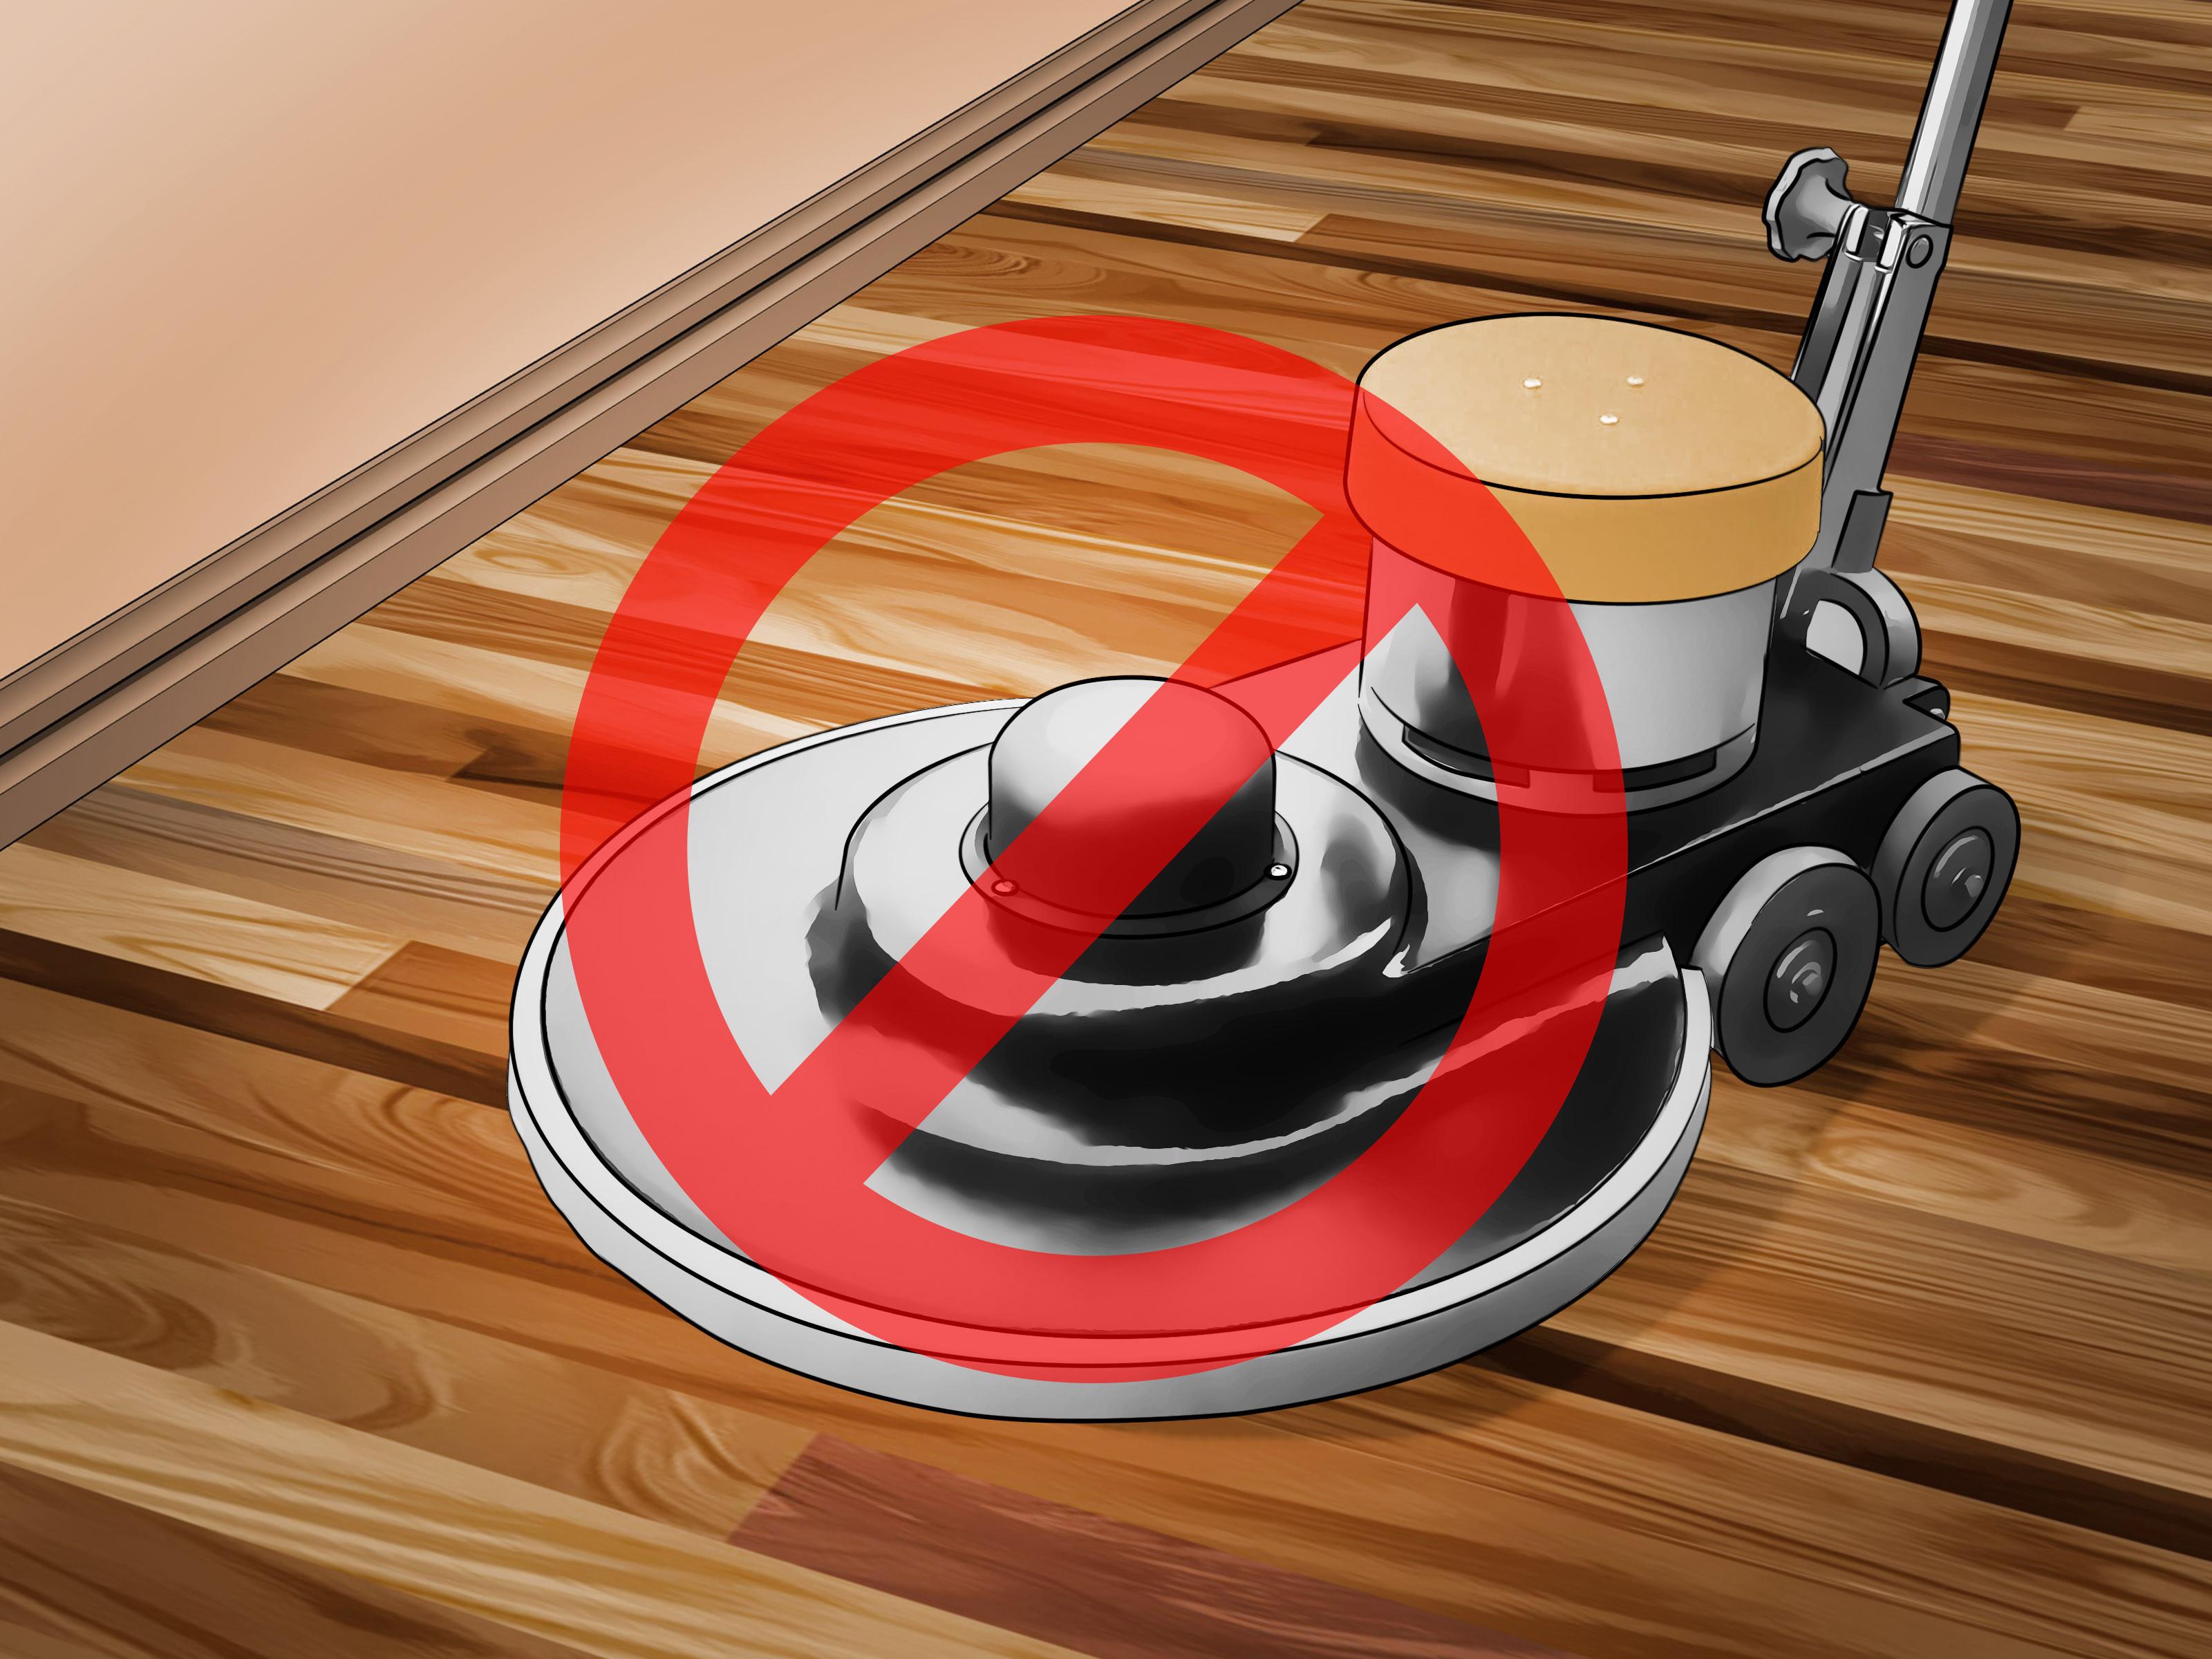 15 Elegant Types Of Dark Hardwood Floors 2021 free download types of dark hardwood floors of 4 ways to clean polyurethane wood floors wikihow within clean polyurethane wood floors step 15